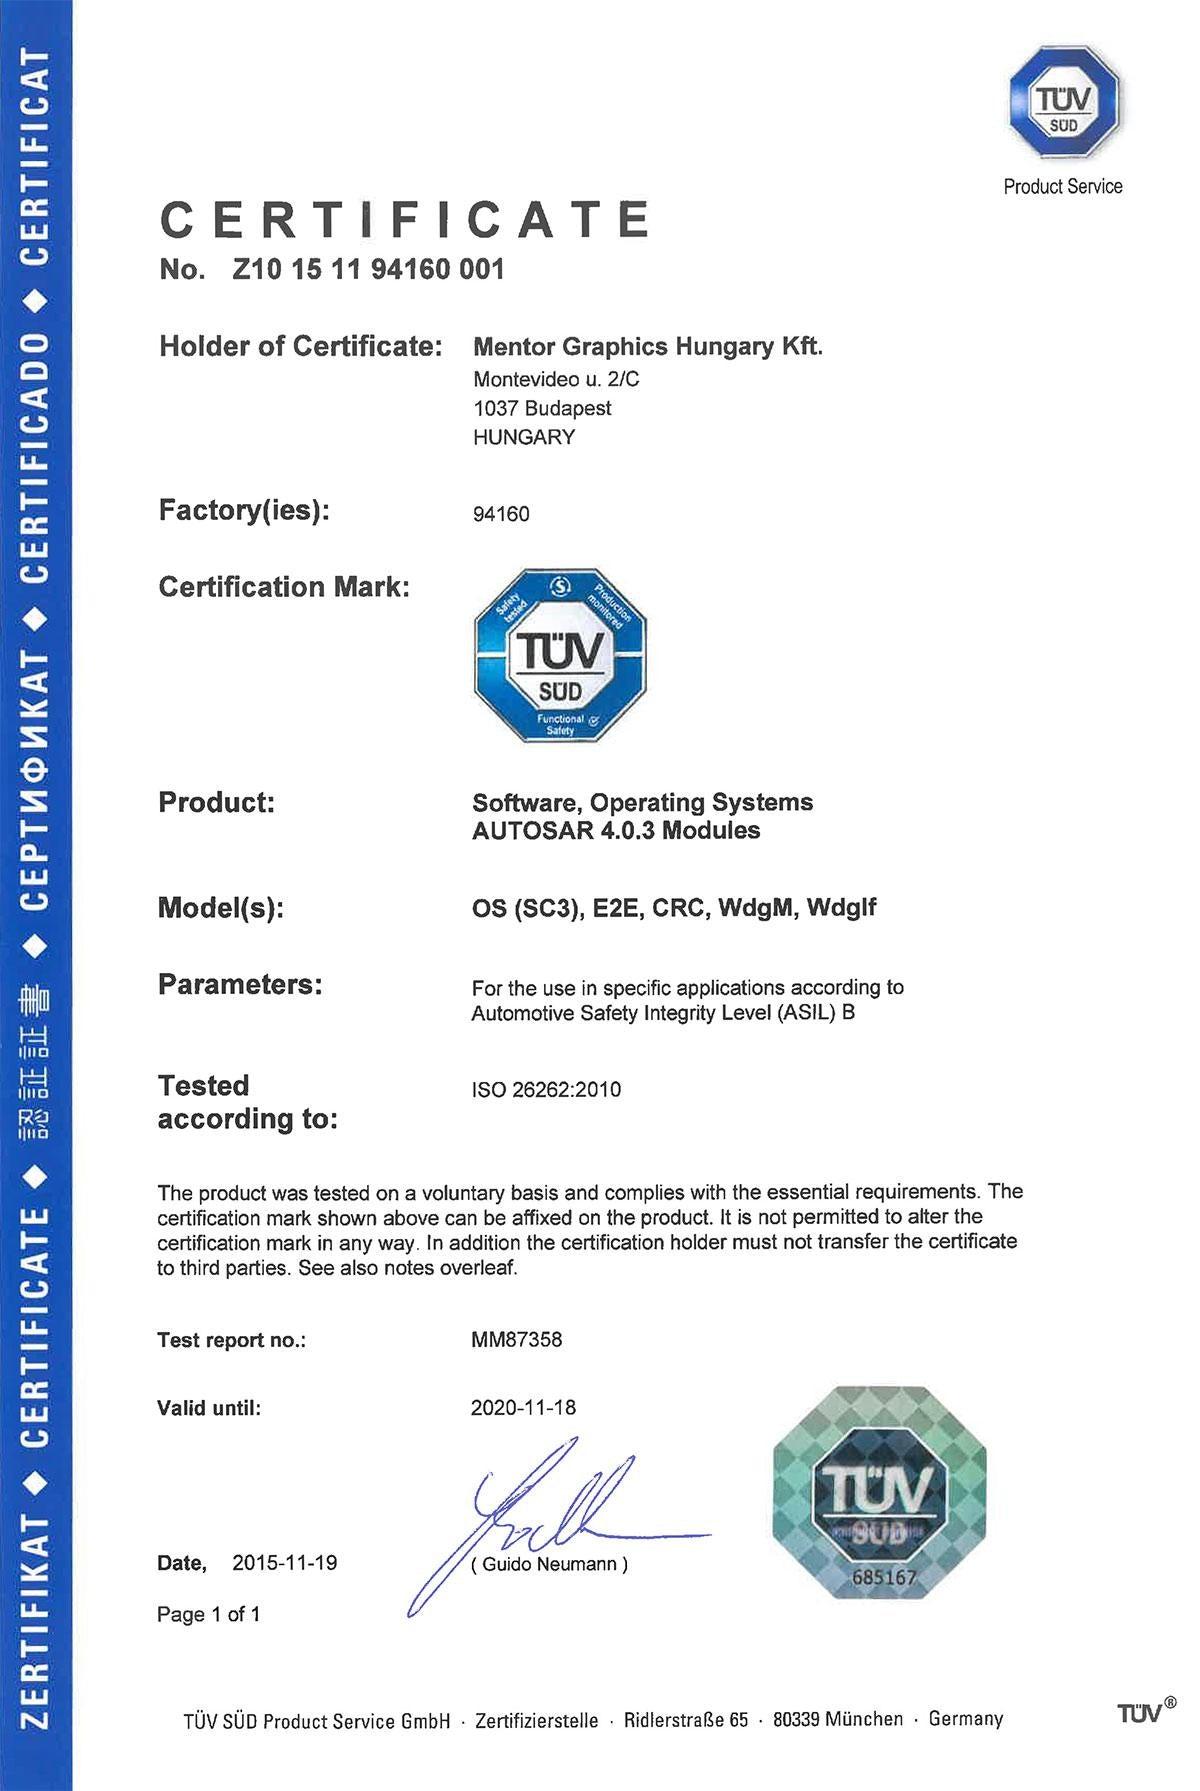 ISO 26262合规证书